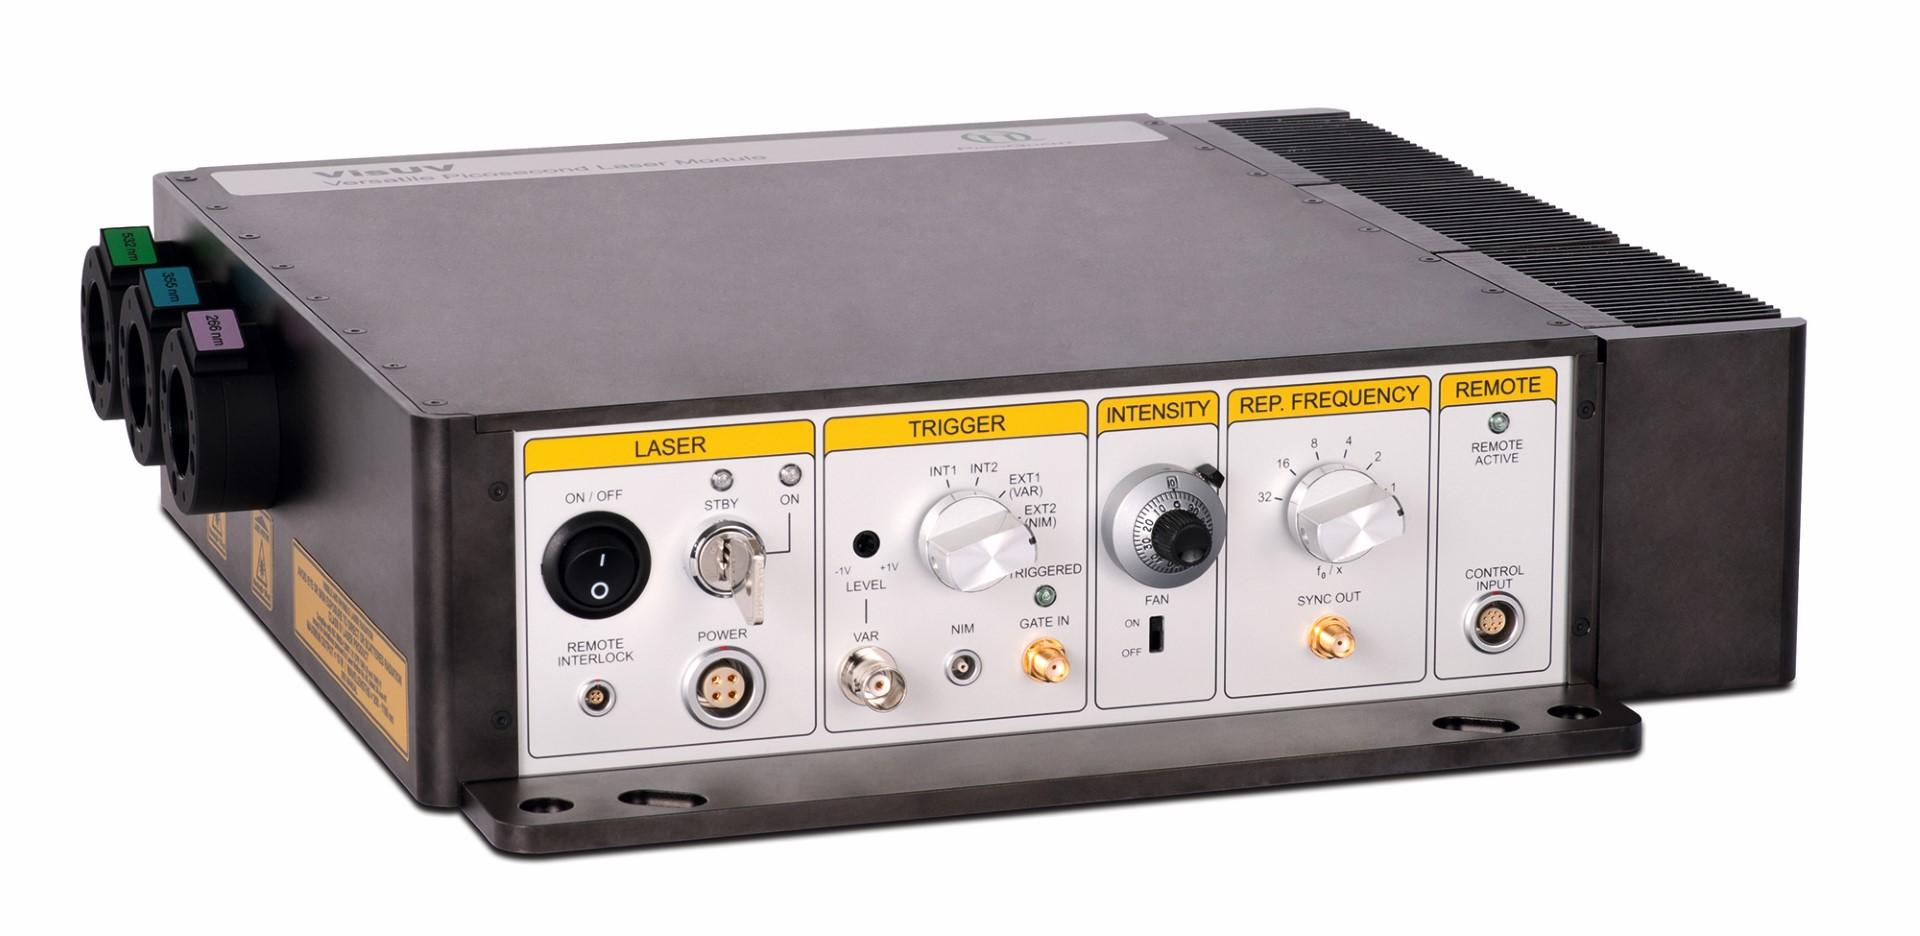 PicoQuant expands its VisUV picosecond pulsed laser platform